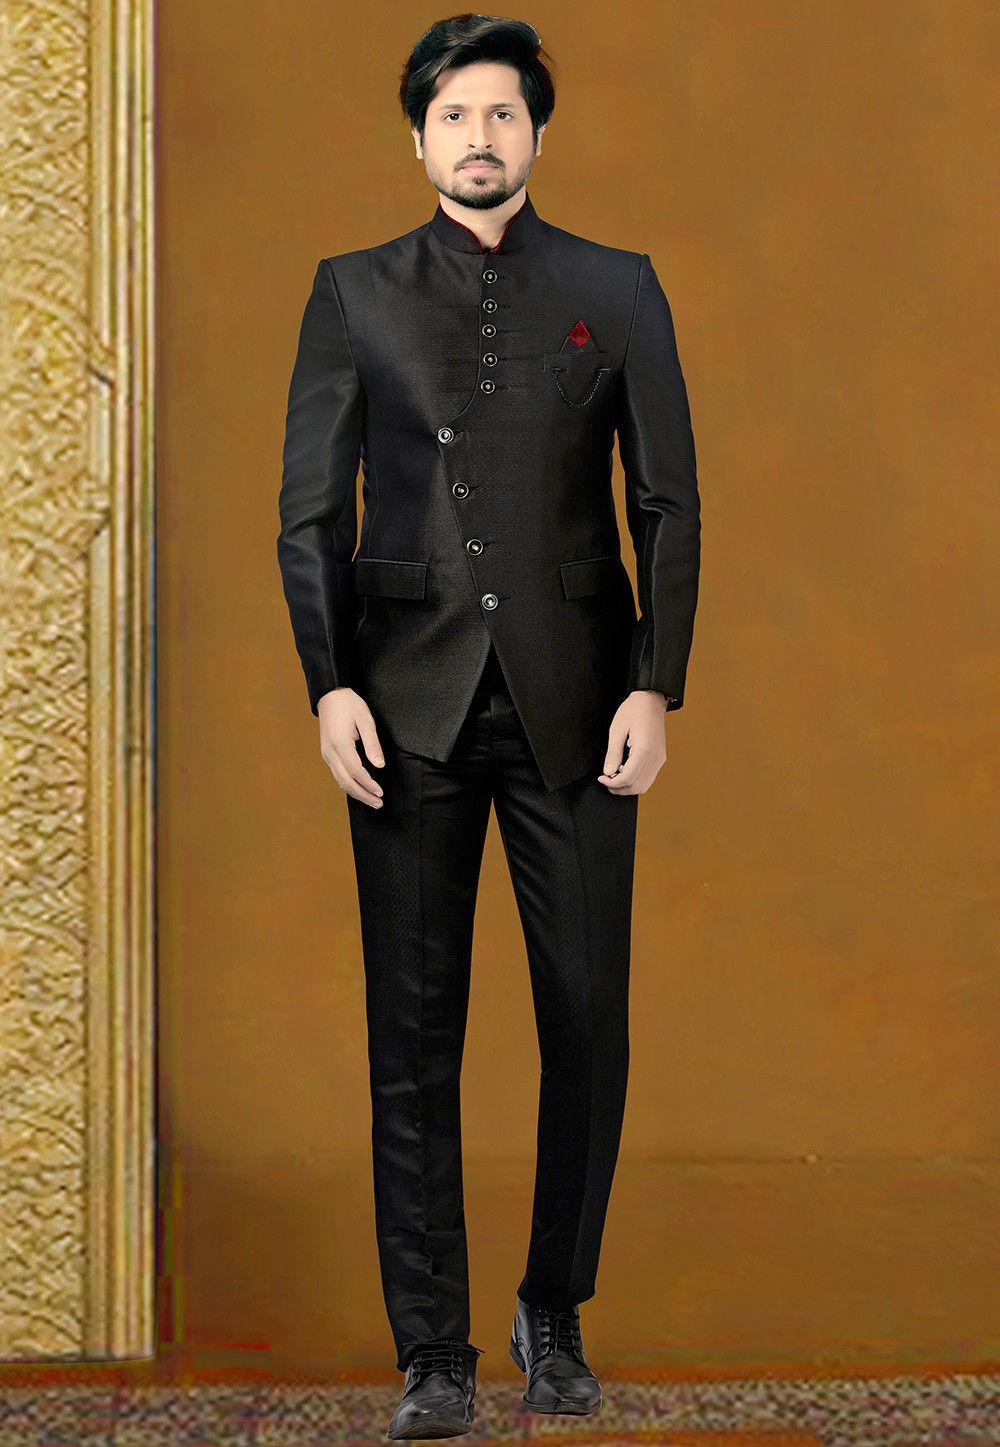 ab3f3439cb ... Woven Terry Rayon Jodhpuri Suit in Black. Zoom